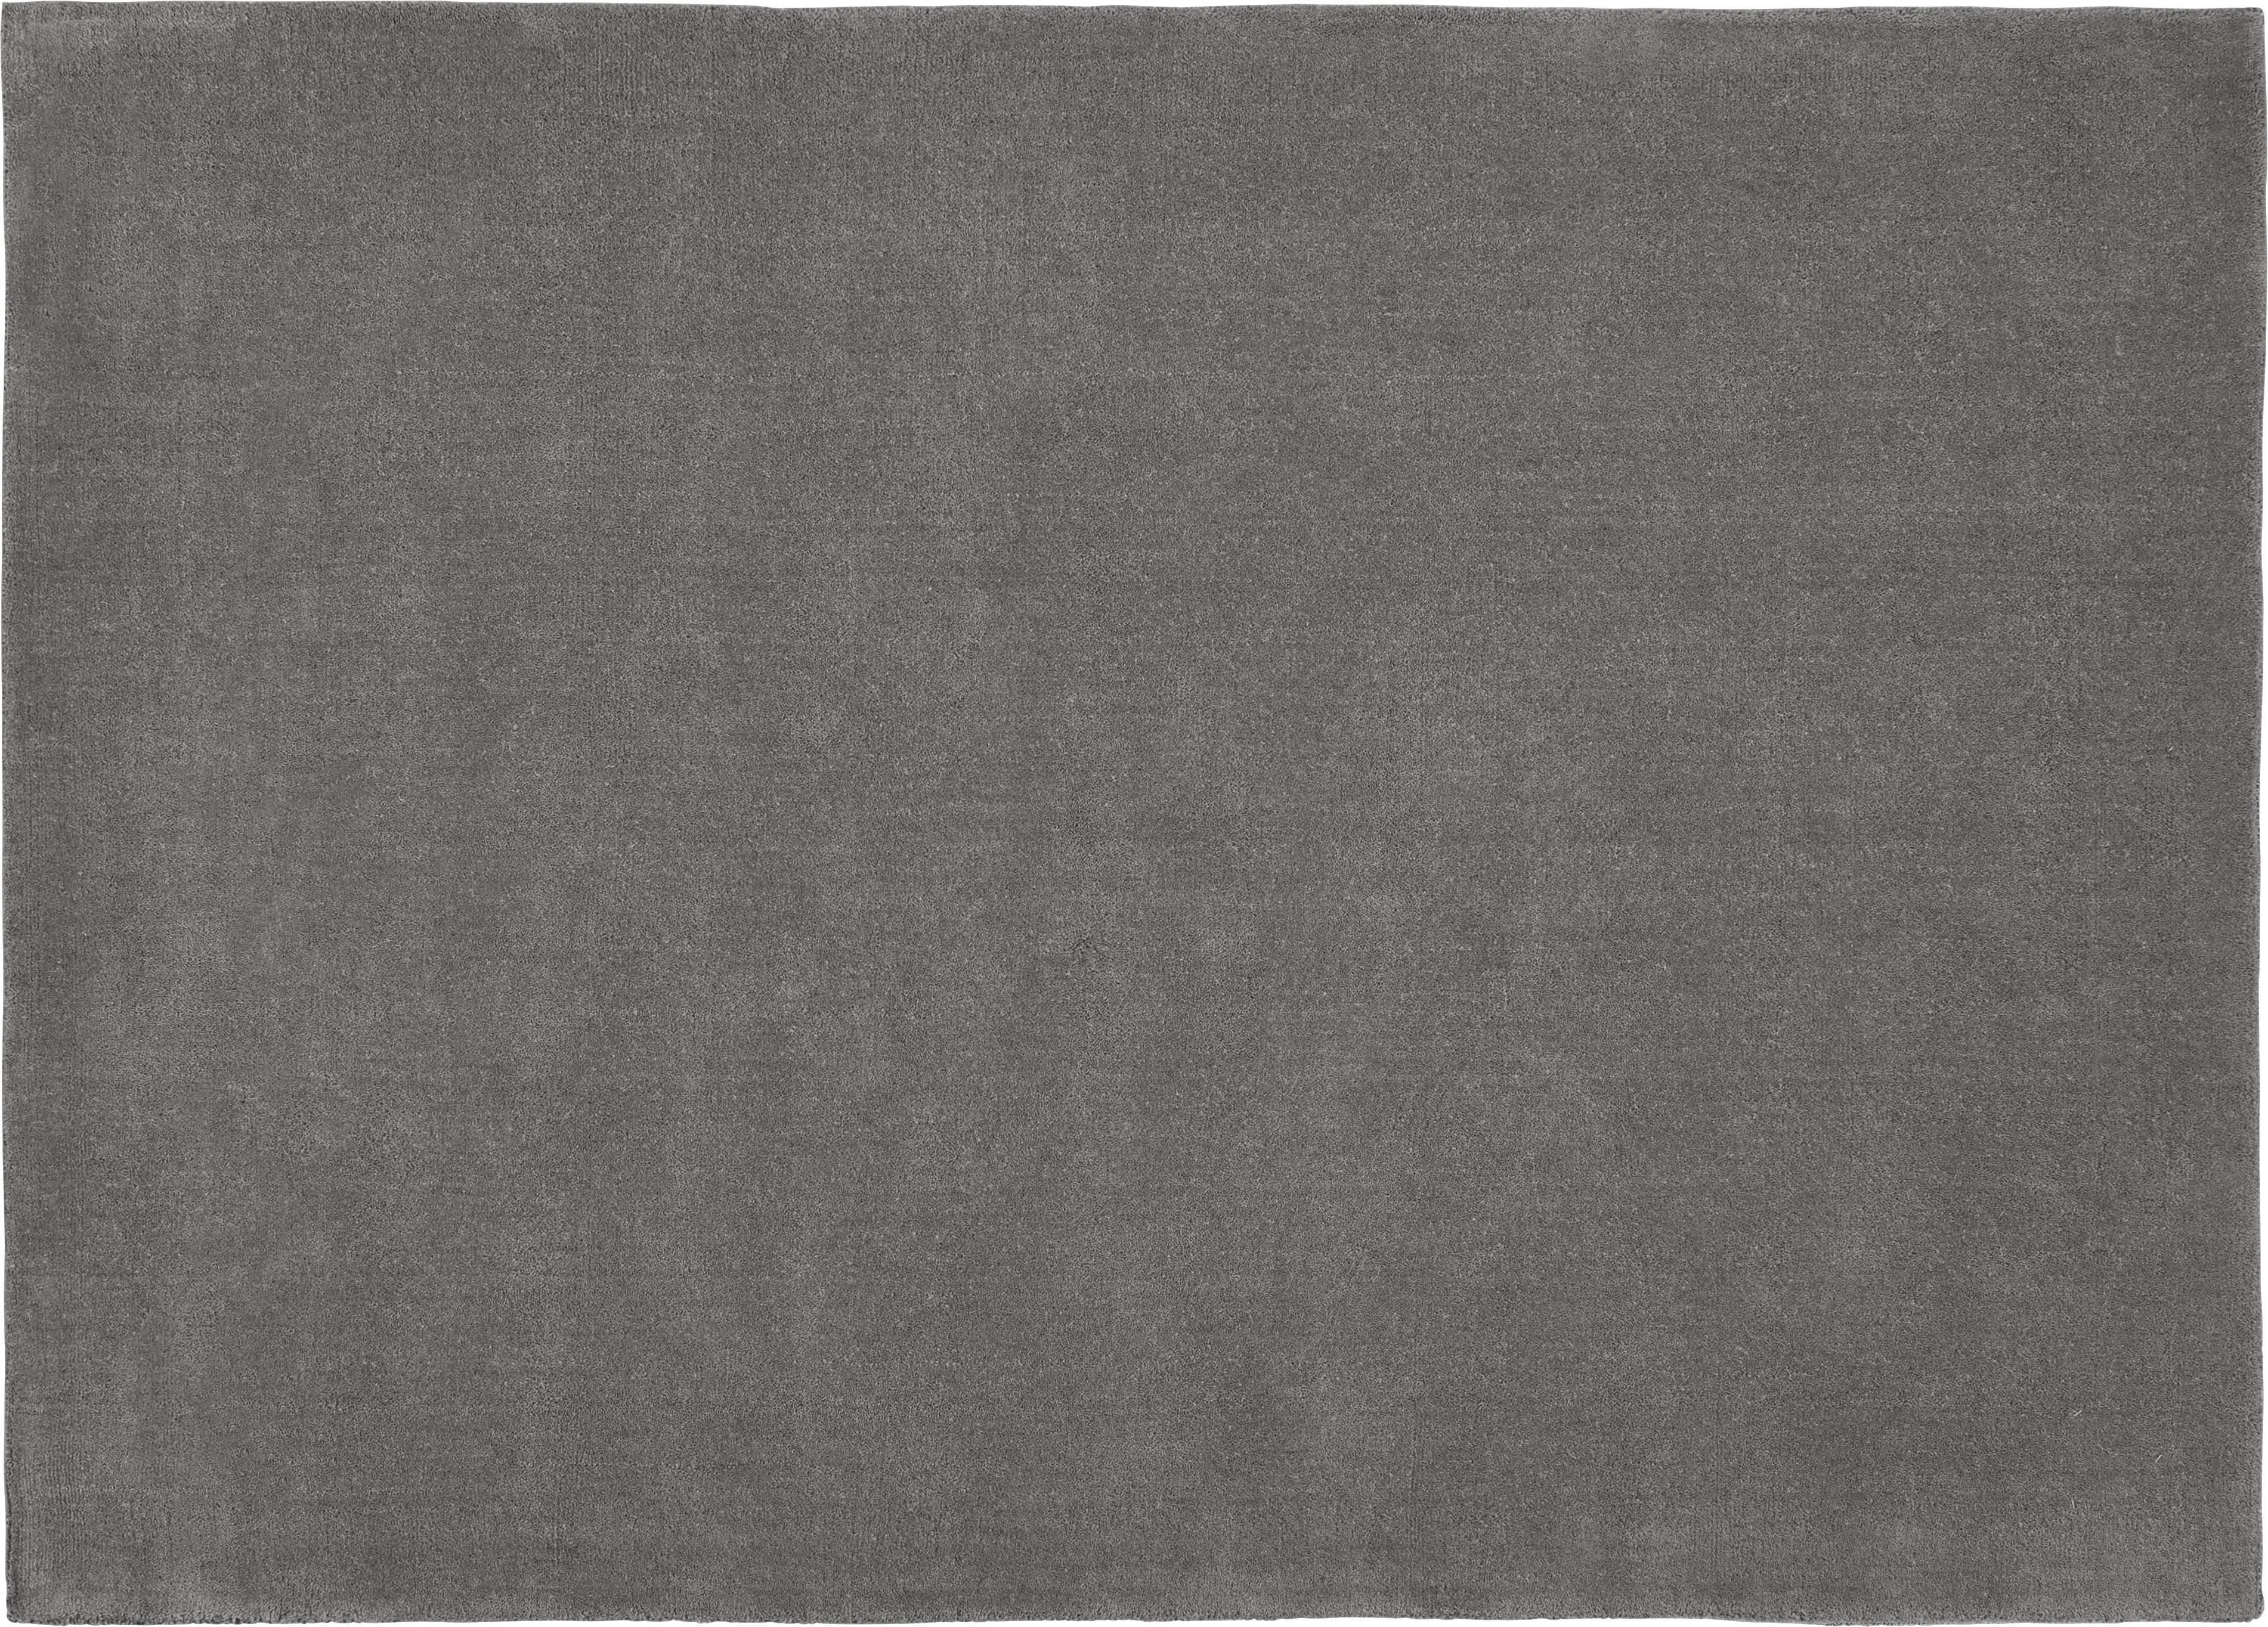 Handwebteppich Carolin 140x200cm - Grau, MODERN, Textil (140/200cm) - MÖMAX modern living